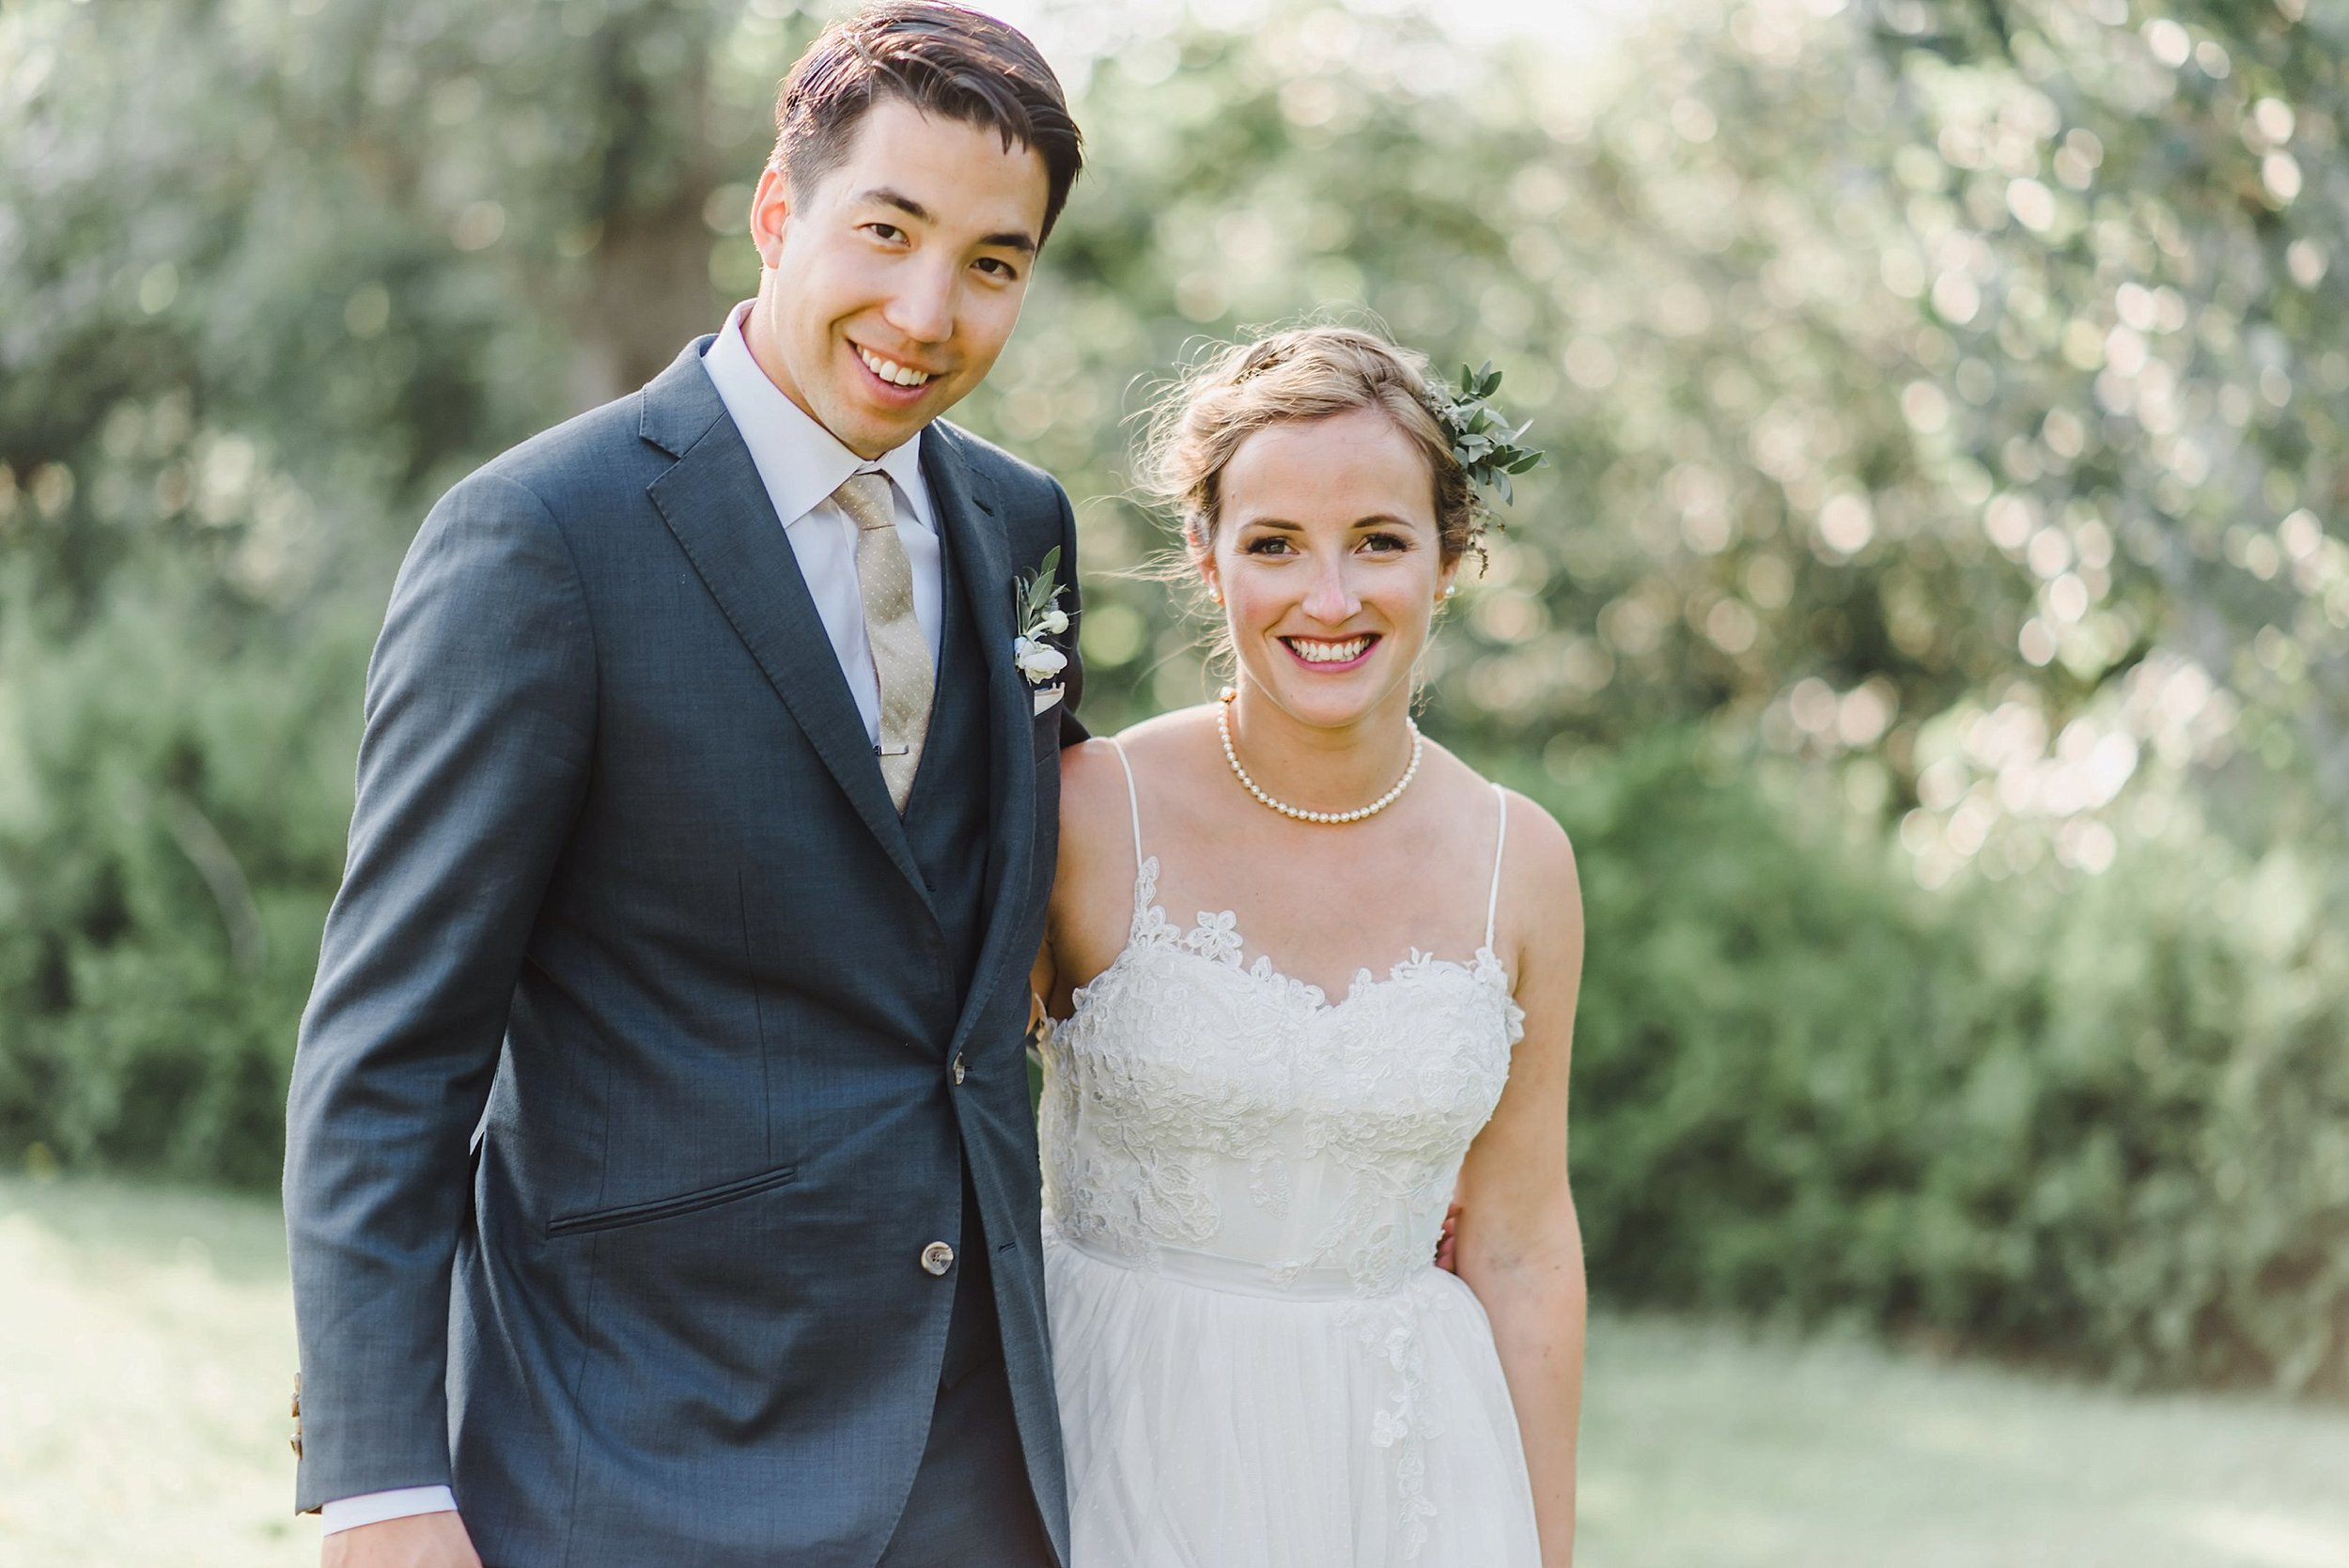 light airy indie fine art ottawa wedding photographer | Ali and Batoul Photography_0856.jpg